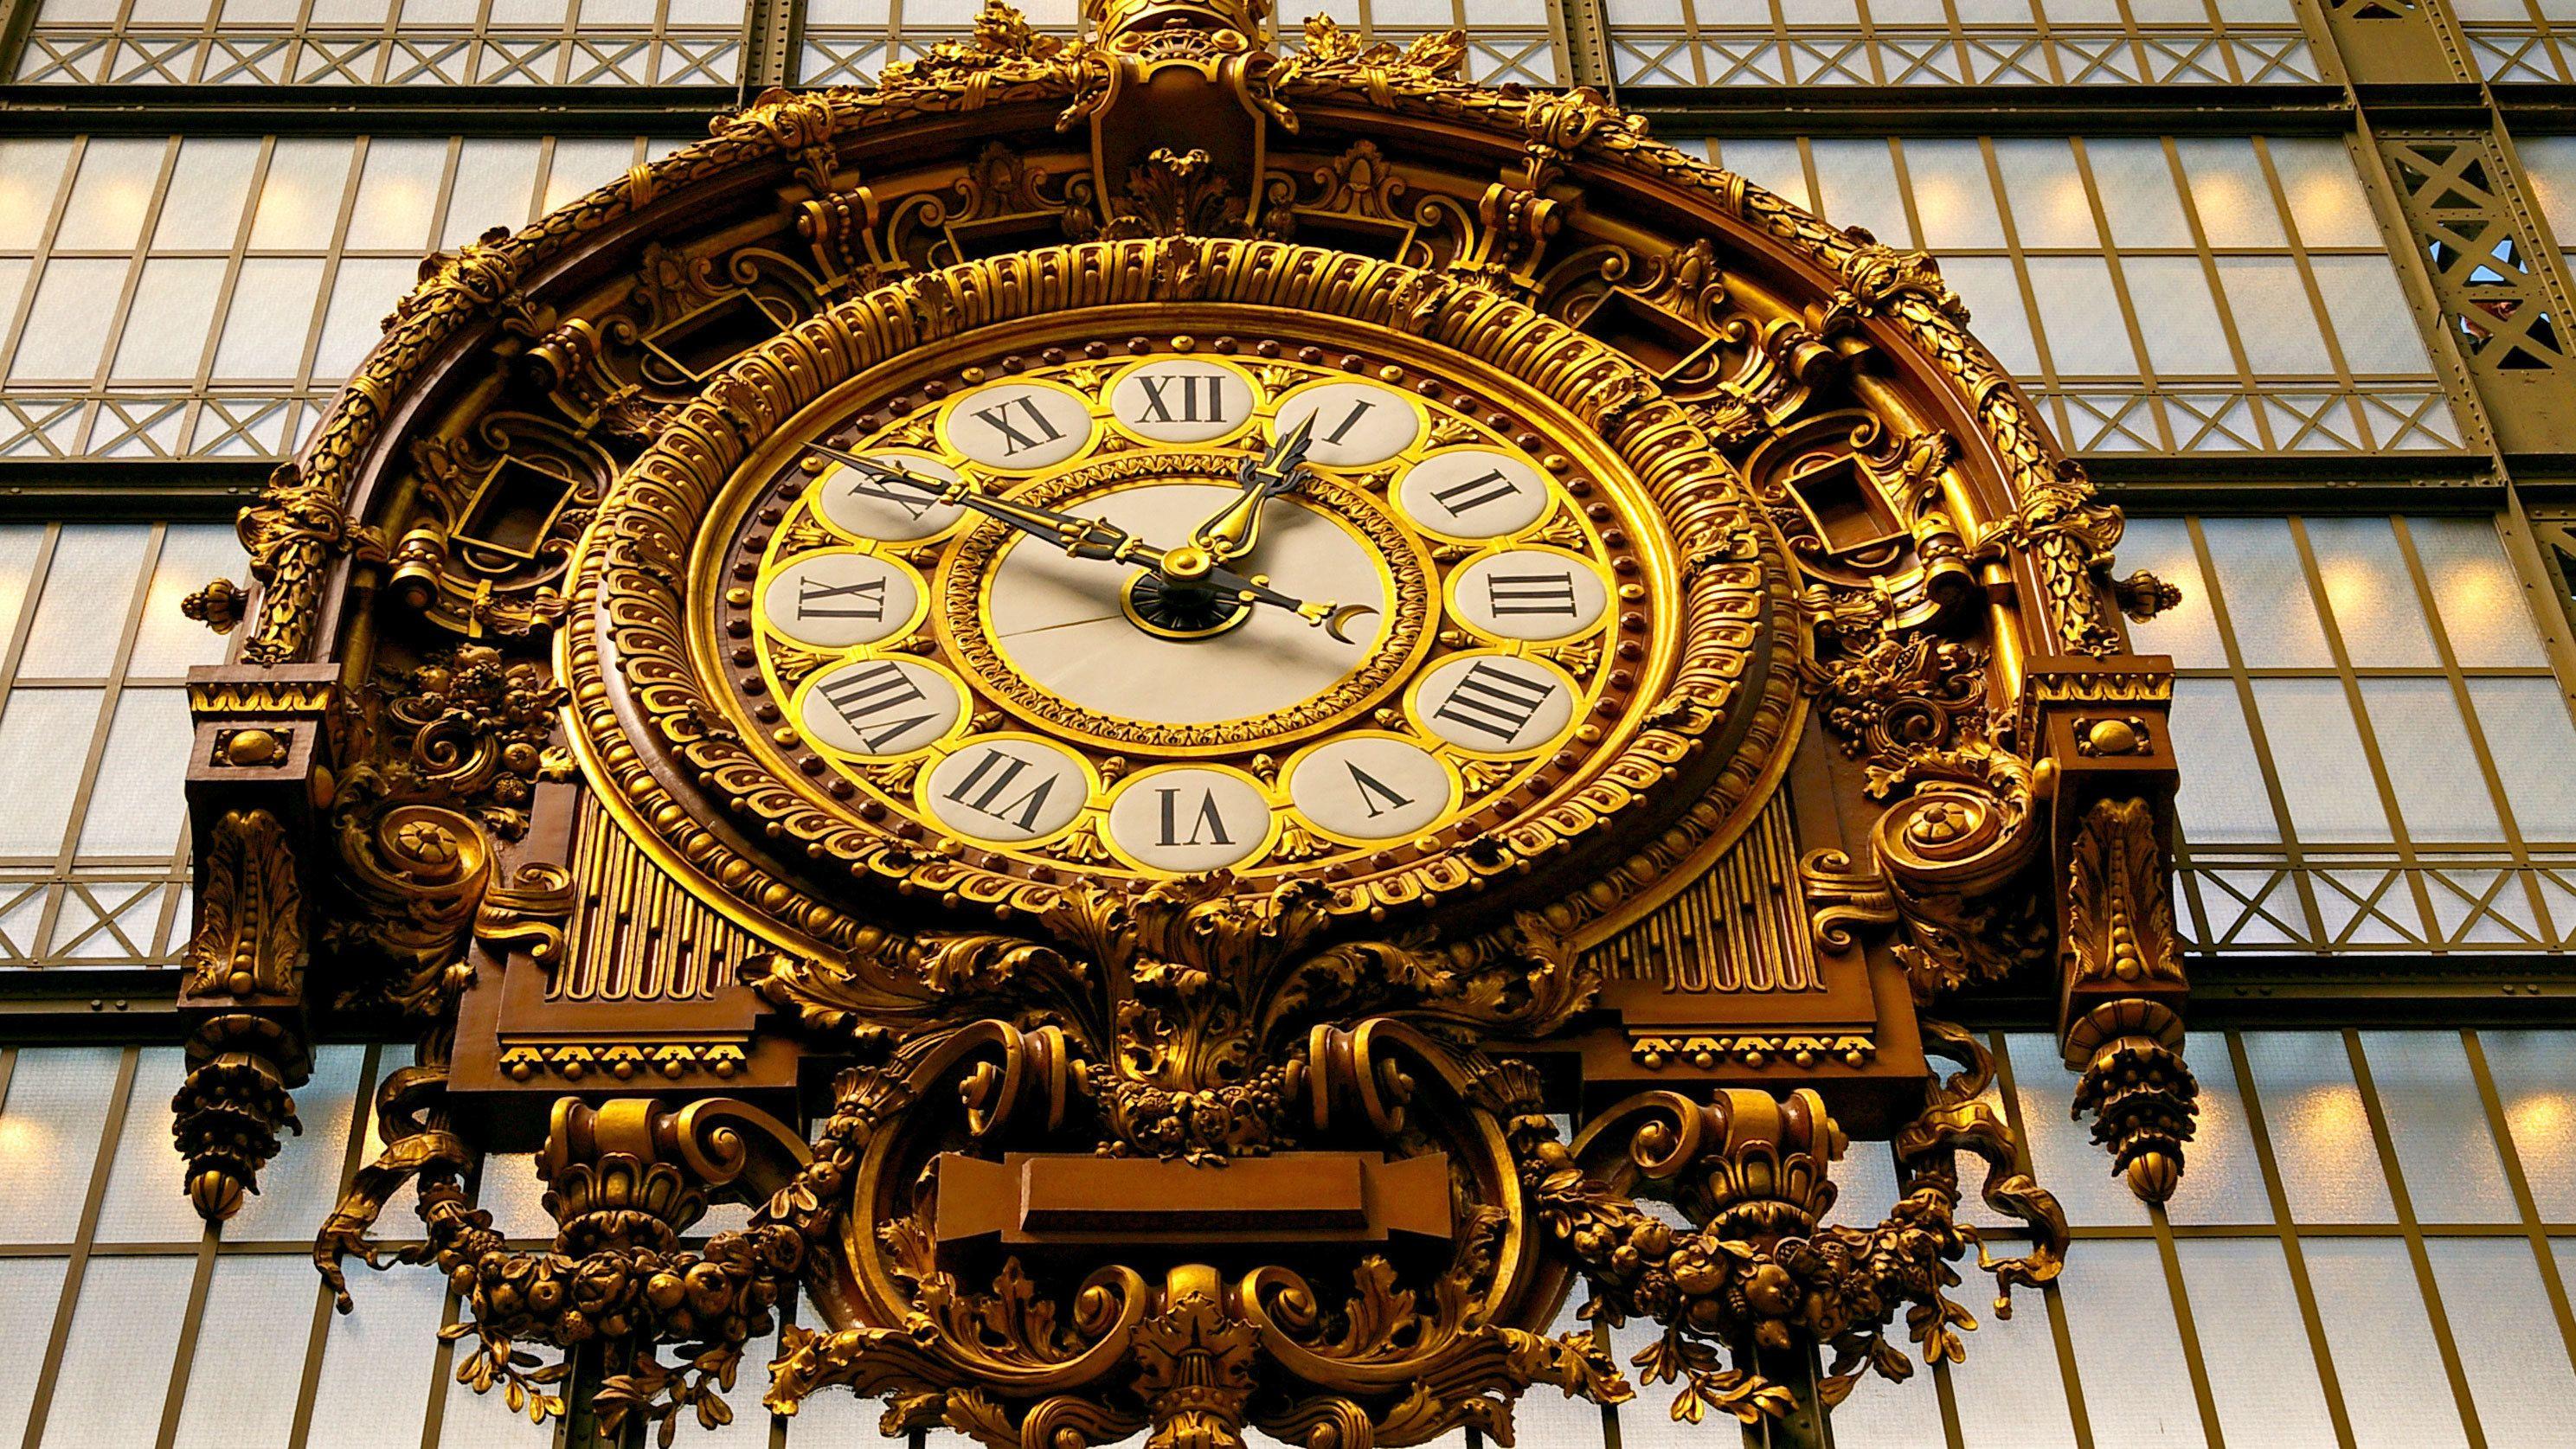 Ornate clock in Paris